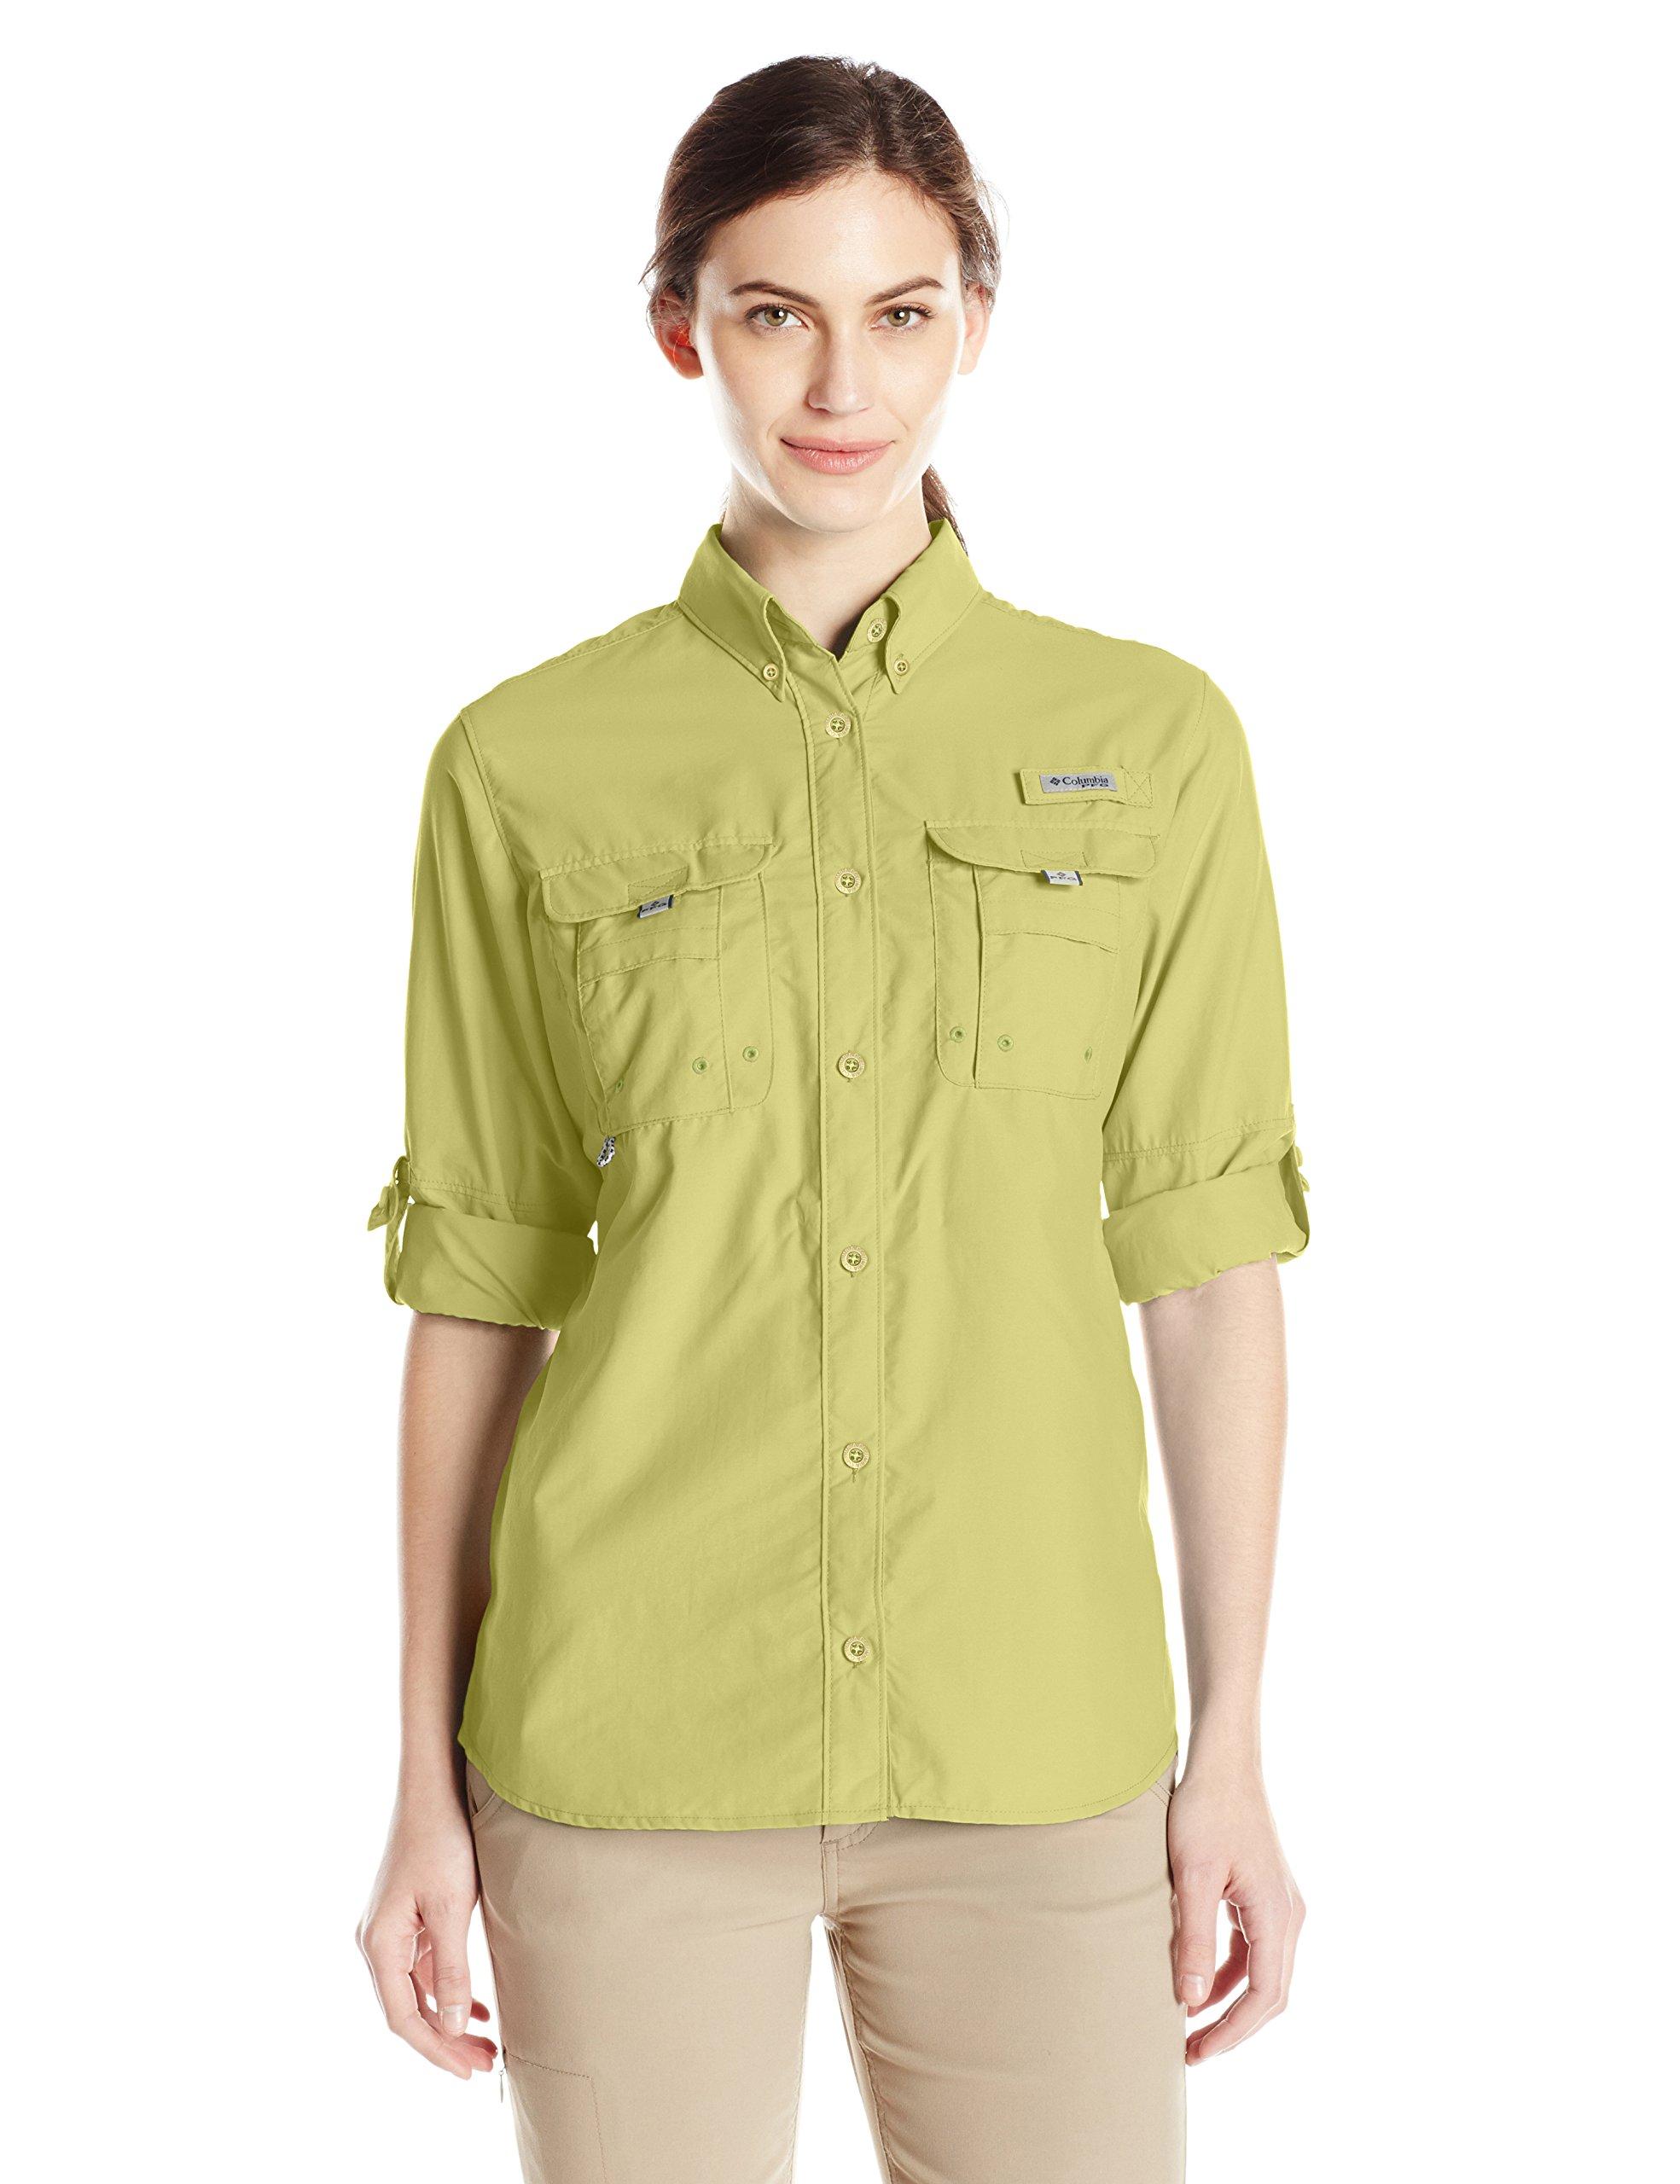 Columbia Women's Bahama Long Sleeve Shirt, Pear, Medium by Columbia (Image #1)